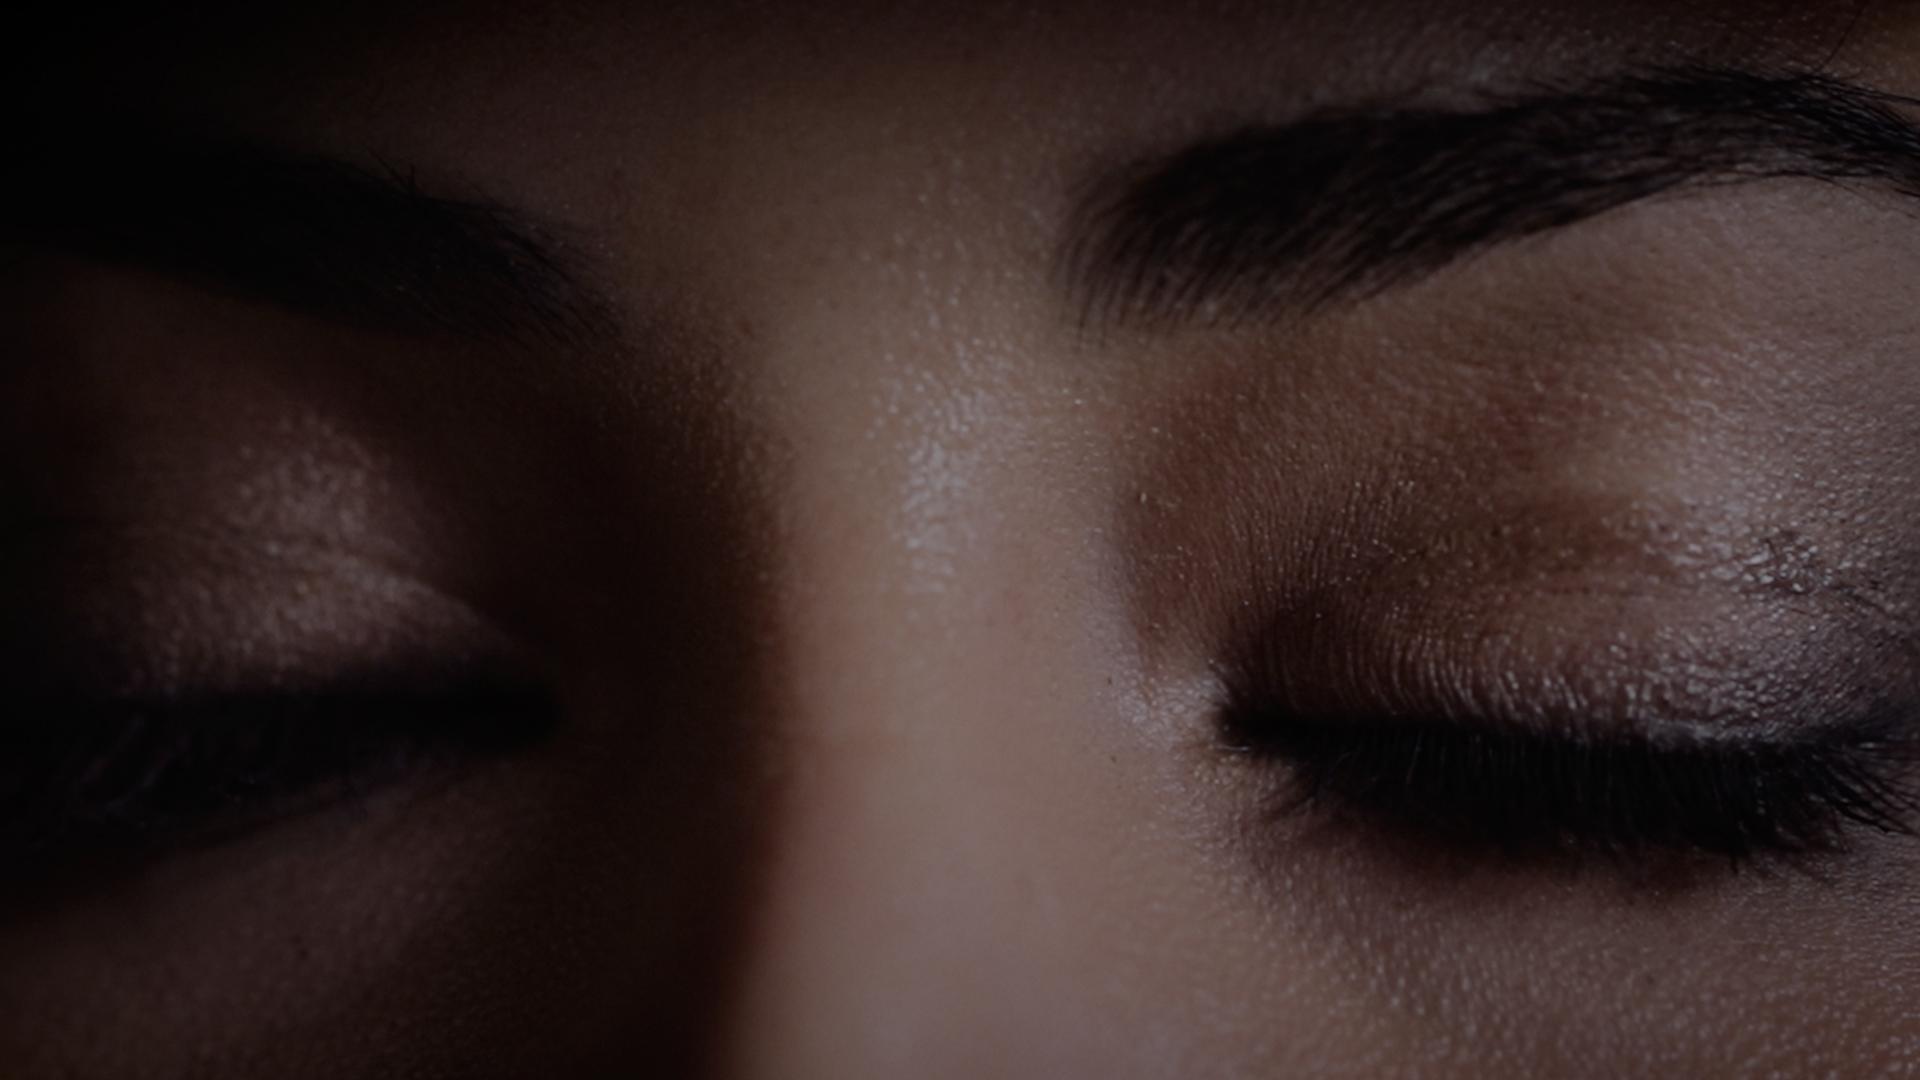 geschlossene Augenlieder